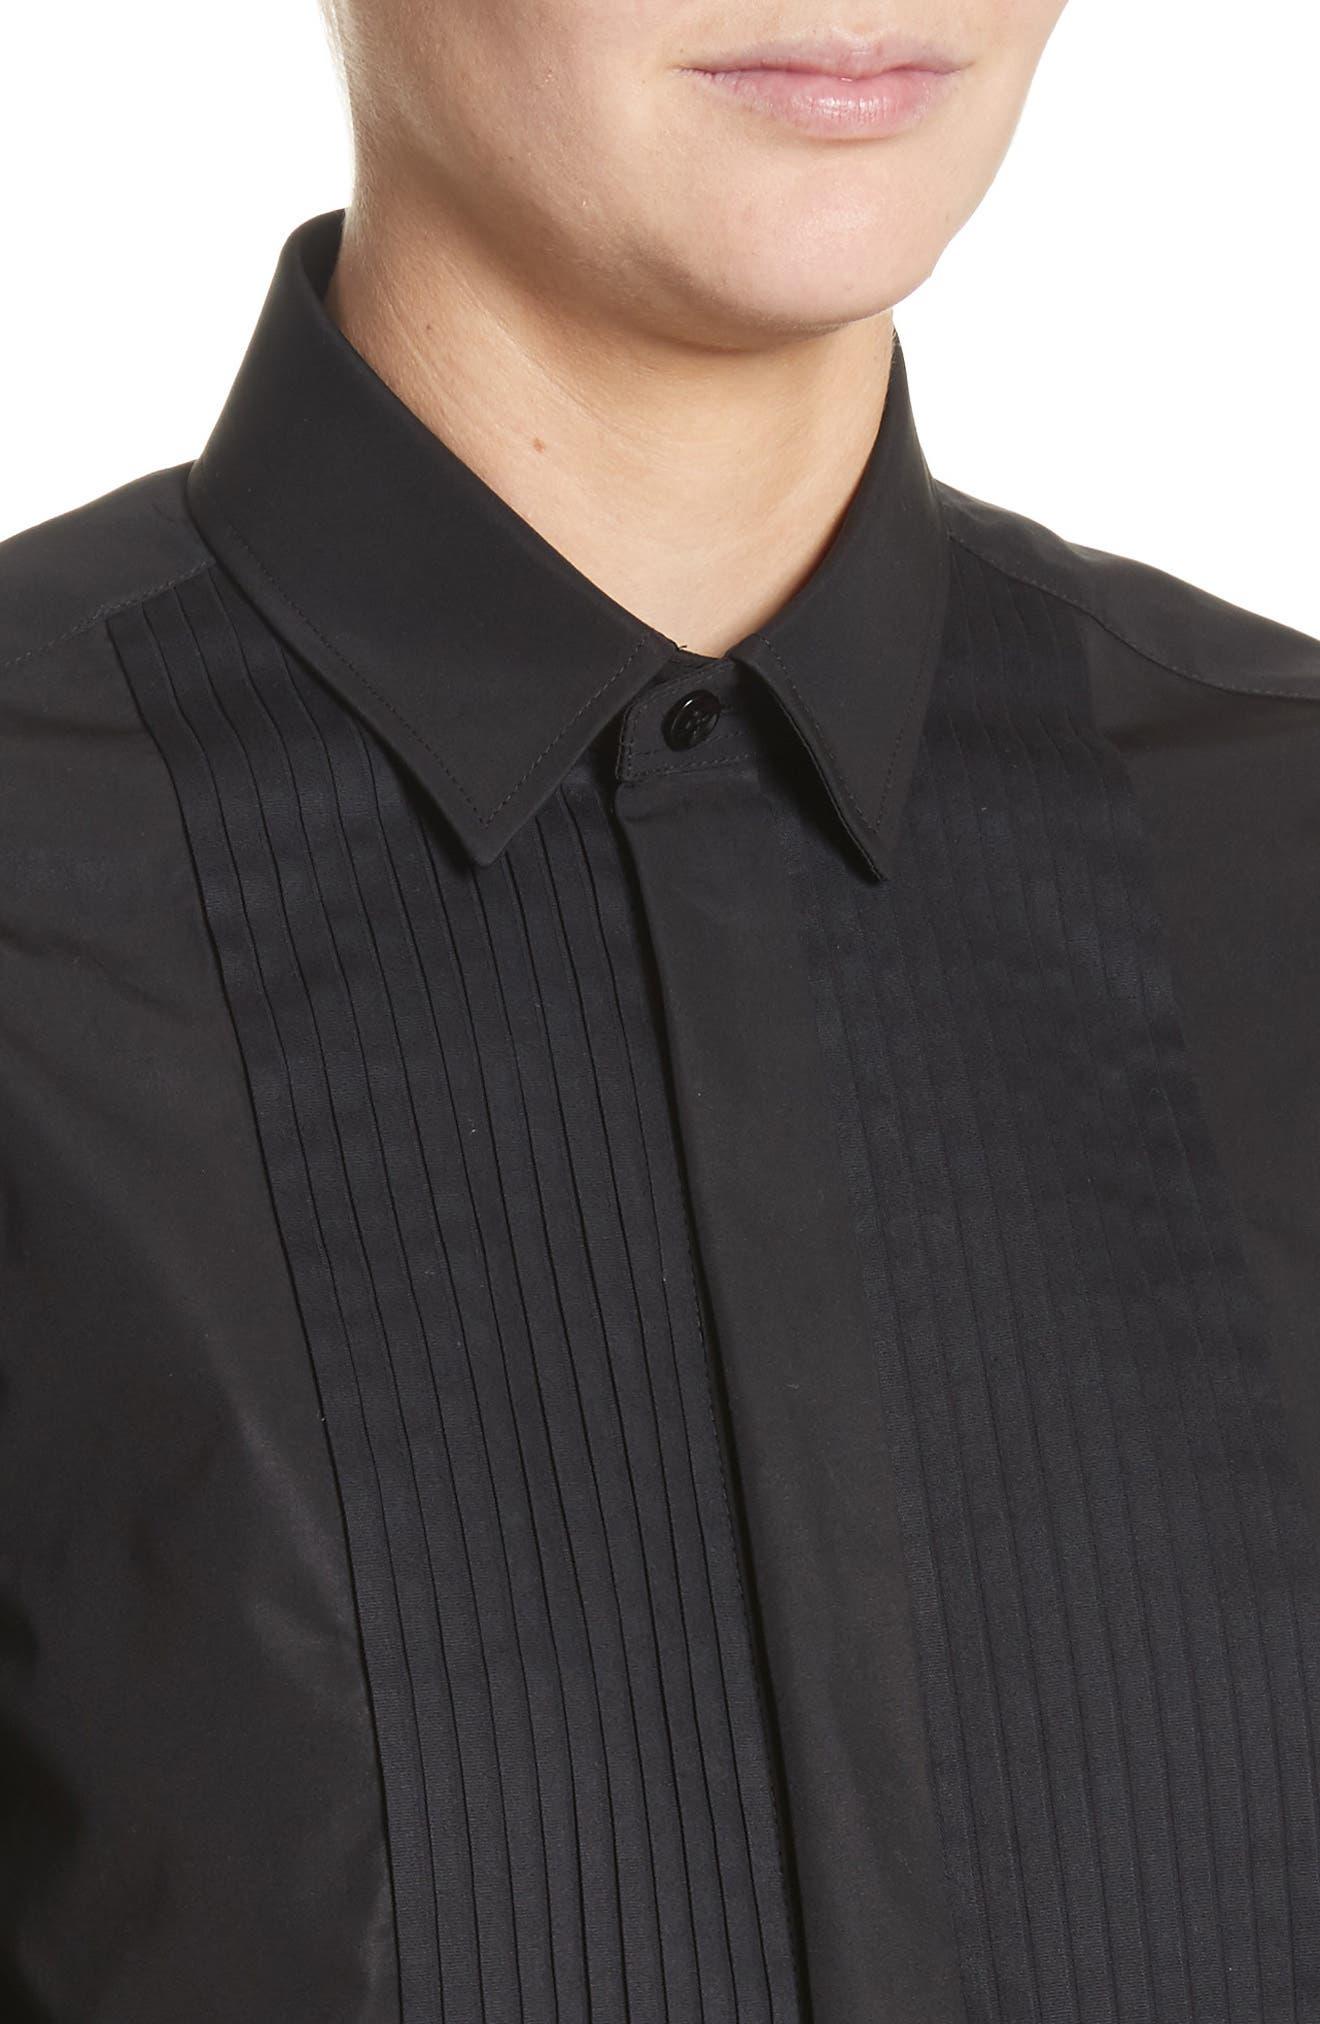 Cotton Tuxedo Shirt,                             Alternate thumbnail 4, color,                             001